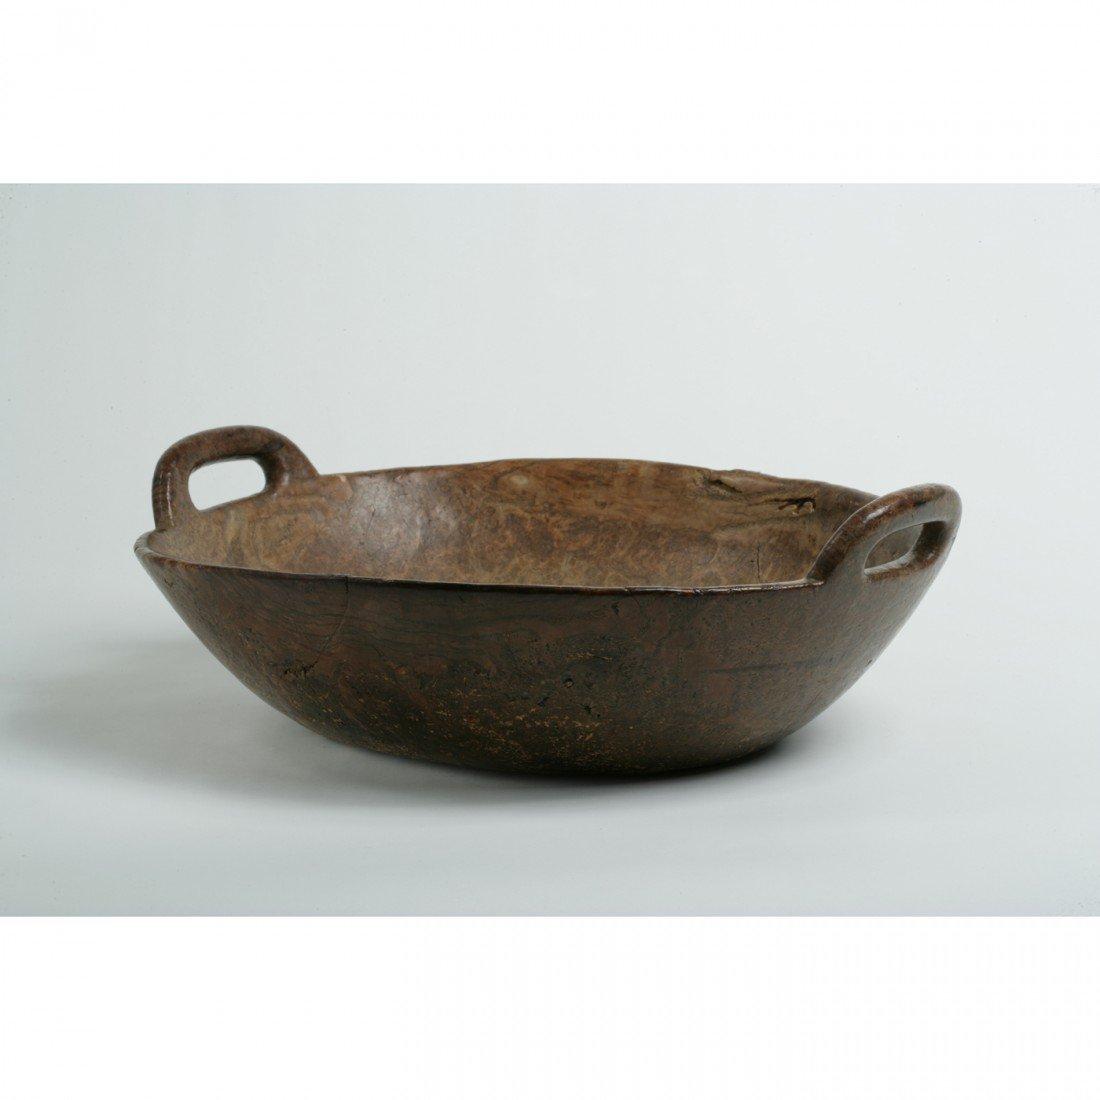 315: Iroquois Ash Burl Bowl With Open Handles